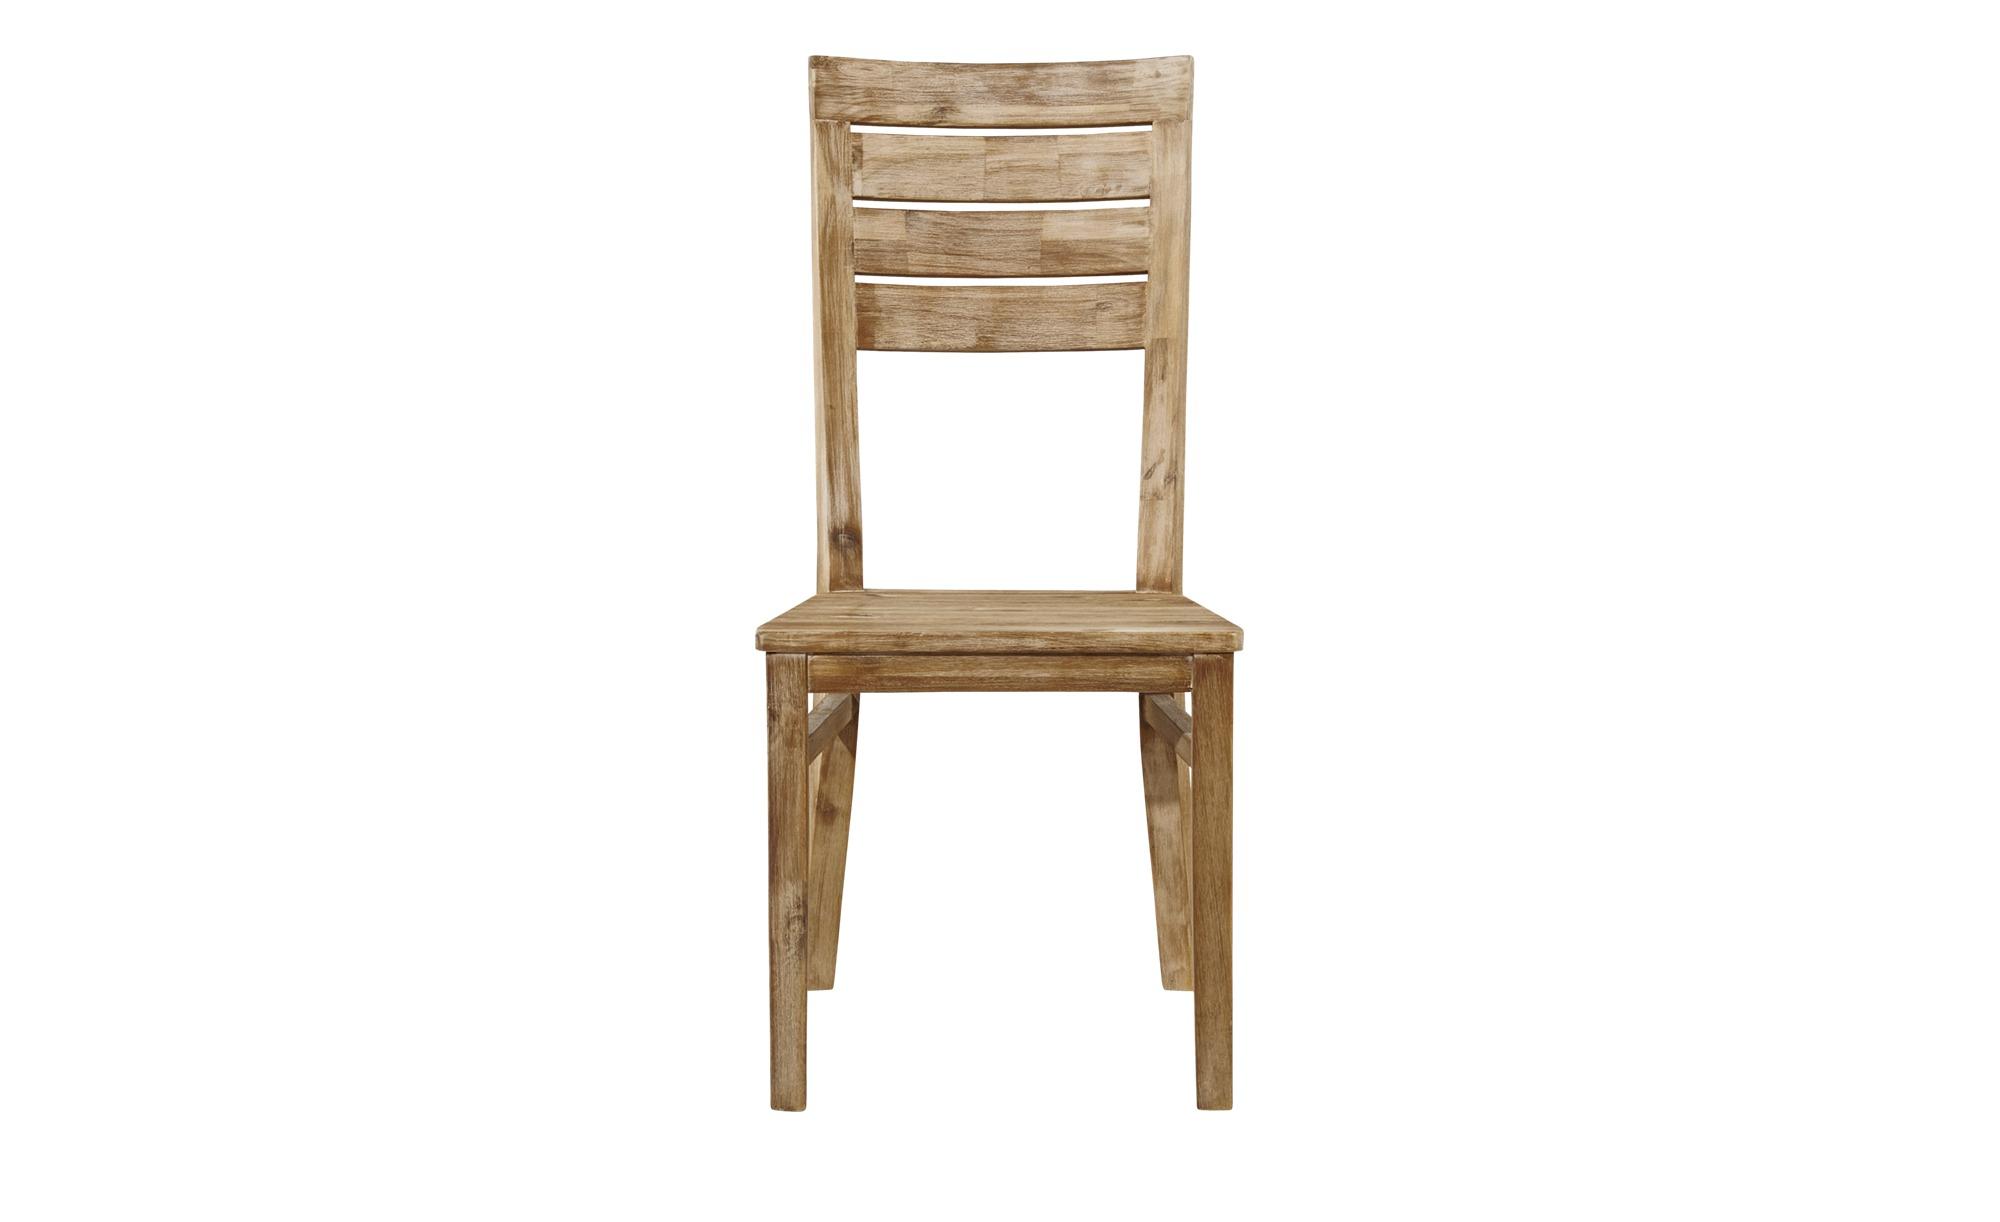 Woodford Stuhl Borneo holzfarben 47 cm 98 cm 41 cm Stühle > Esszimmerstühle Möbel Kraft